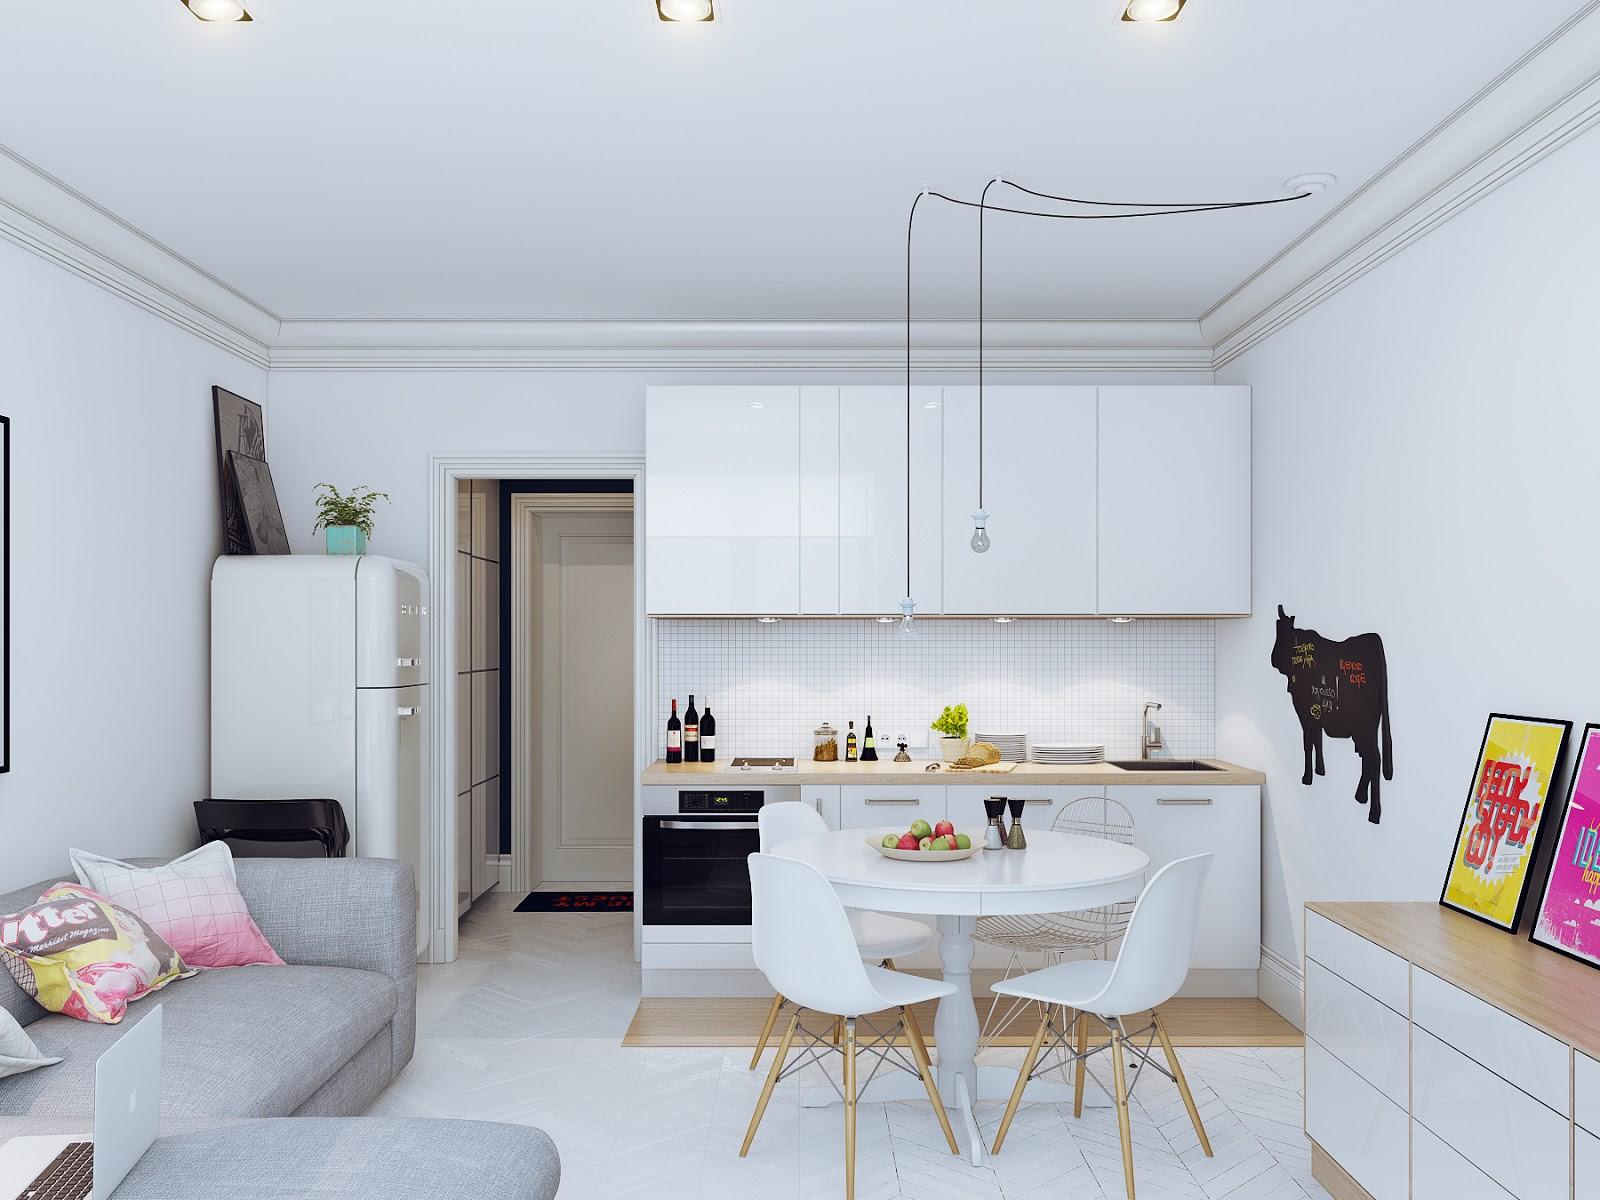 dizayn kuhni 10 kv. m 2 - Идеи интерьера маленькой кухни